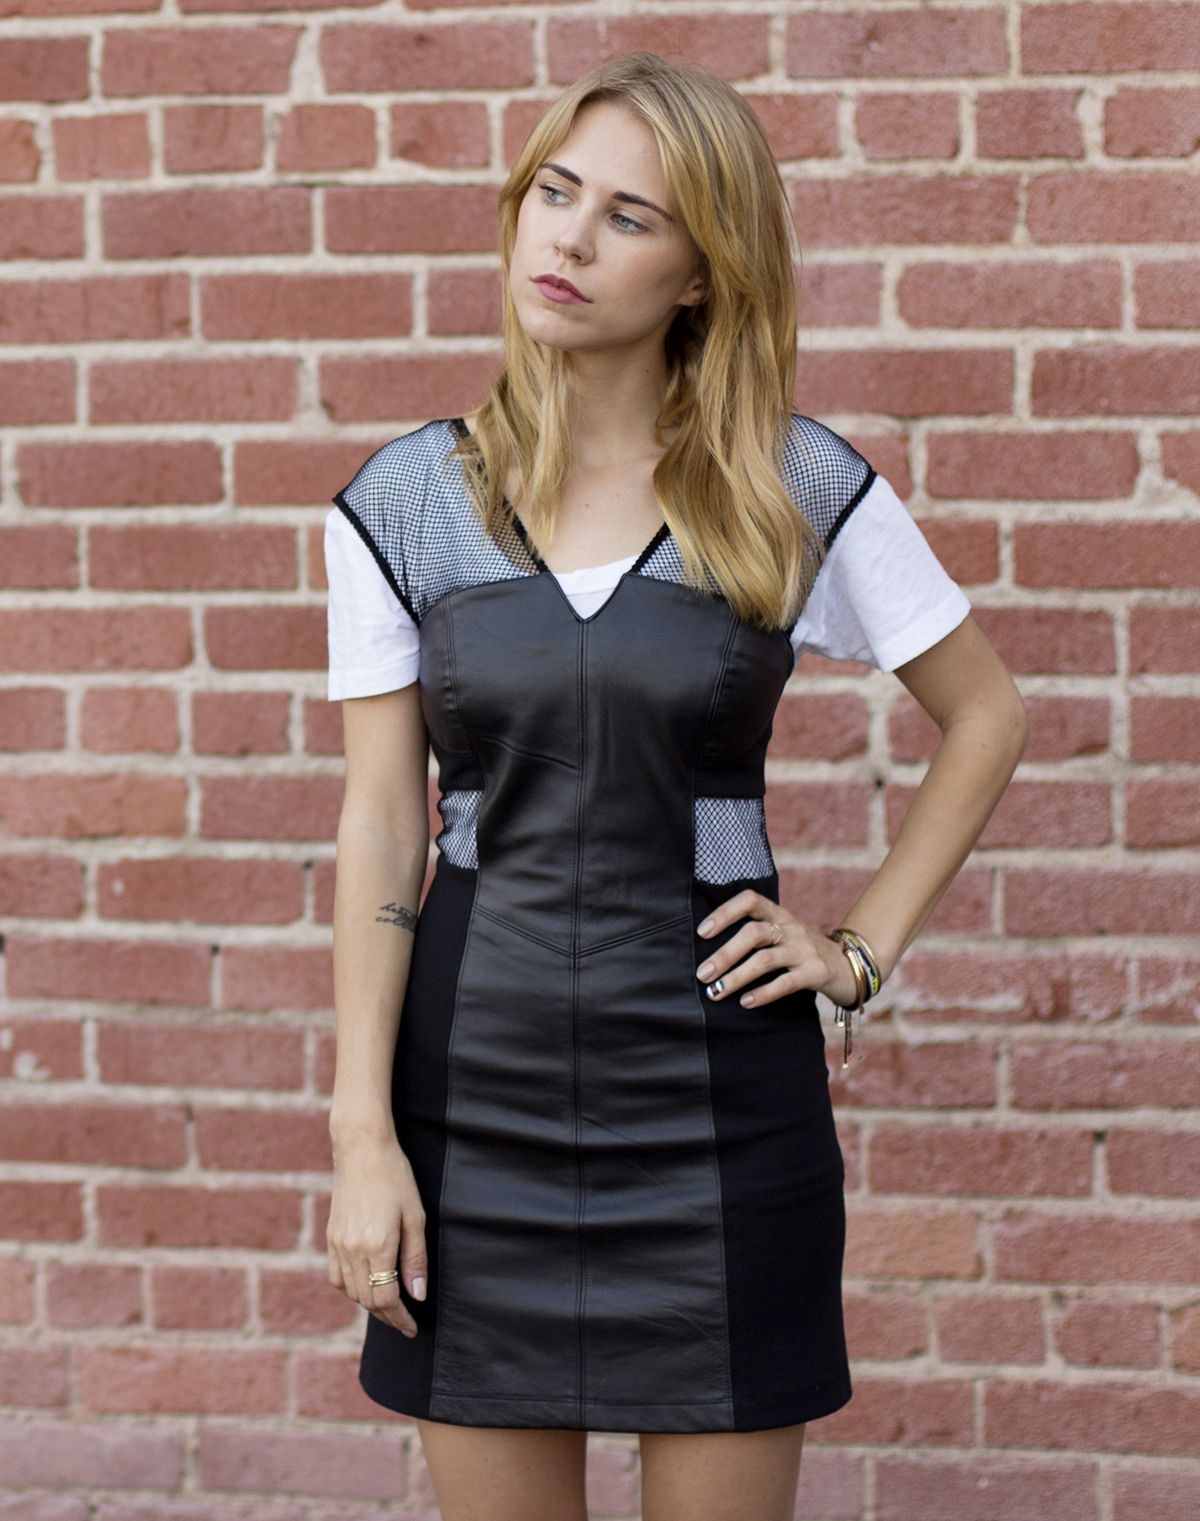 Lna Tee Veda Leather Dress Always Judging